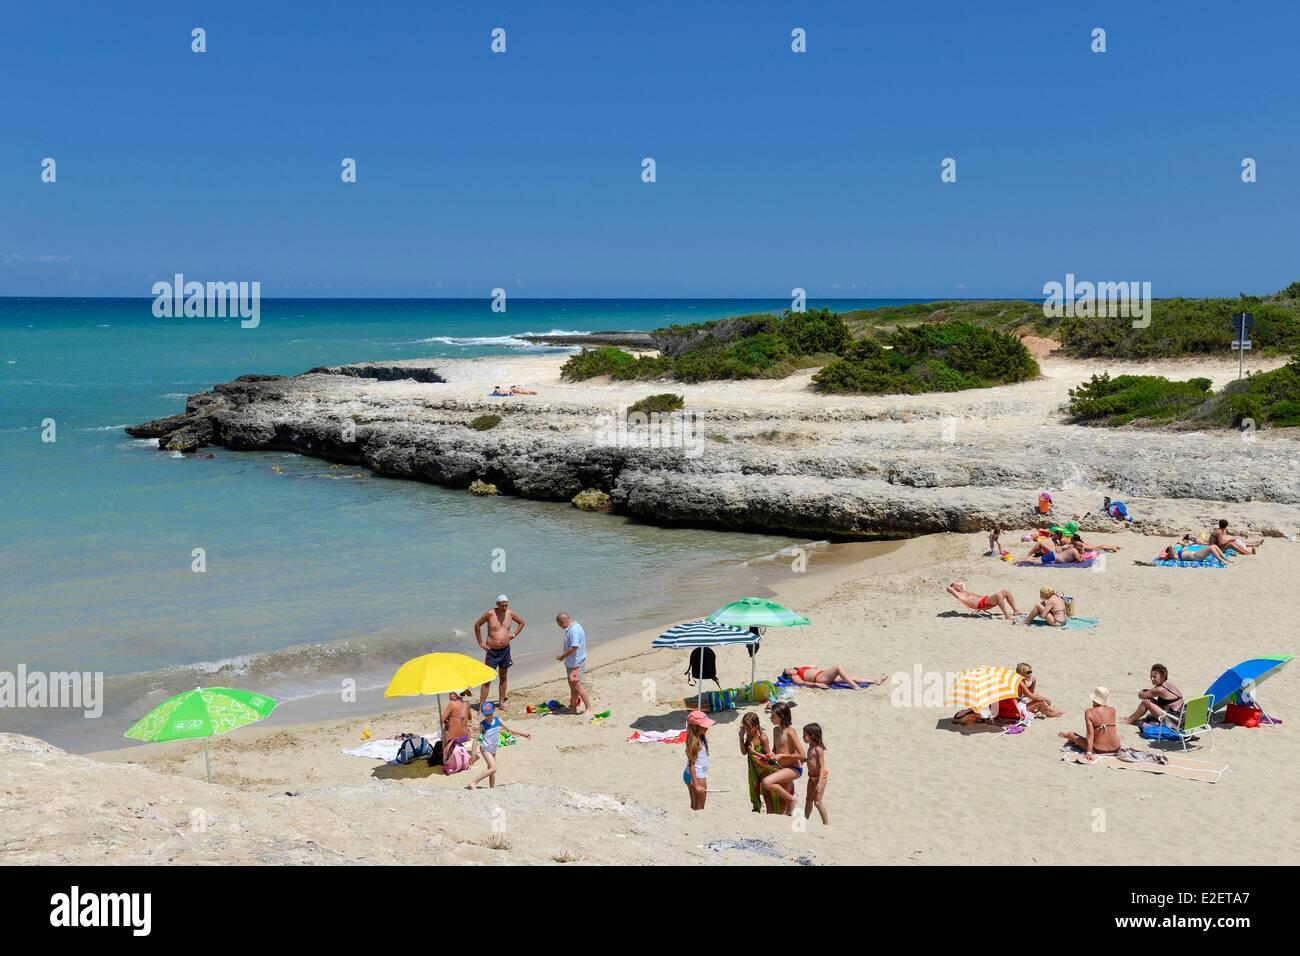 Italia puglia provincia di brindisi ostuni costa meriata - Immagini di spongebob e sabbia ...